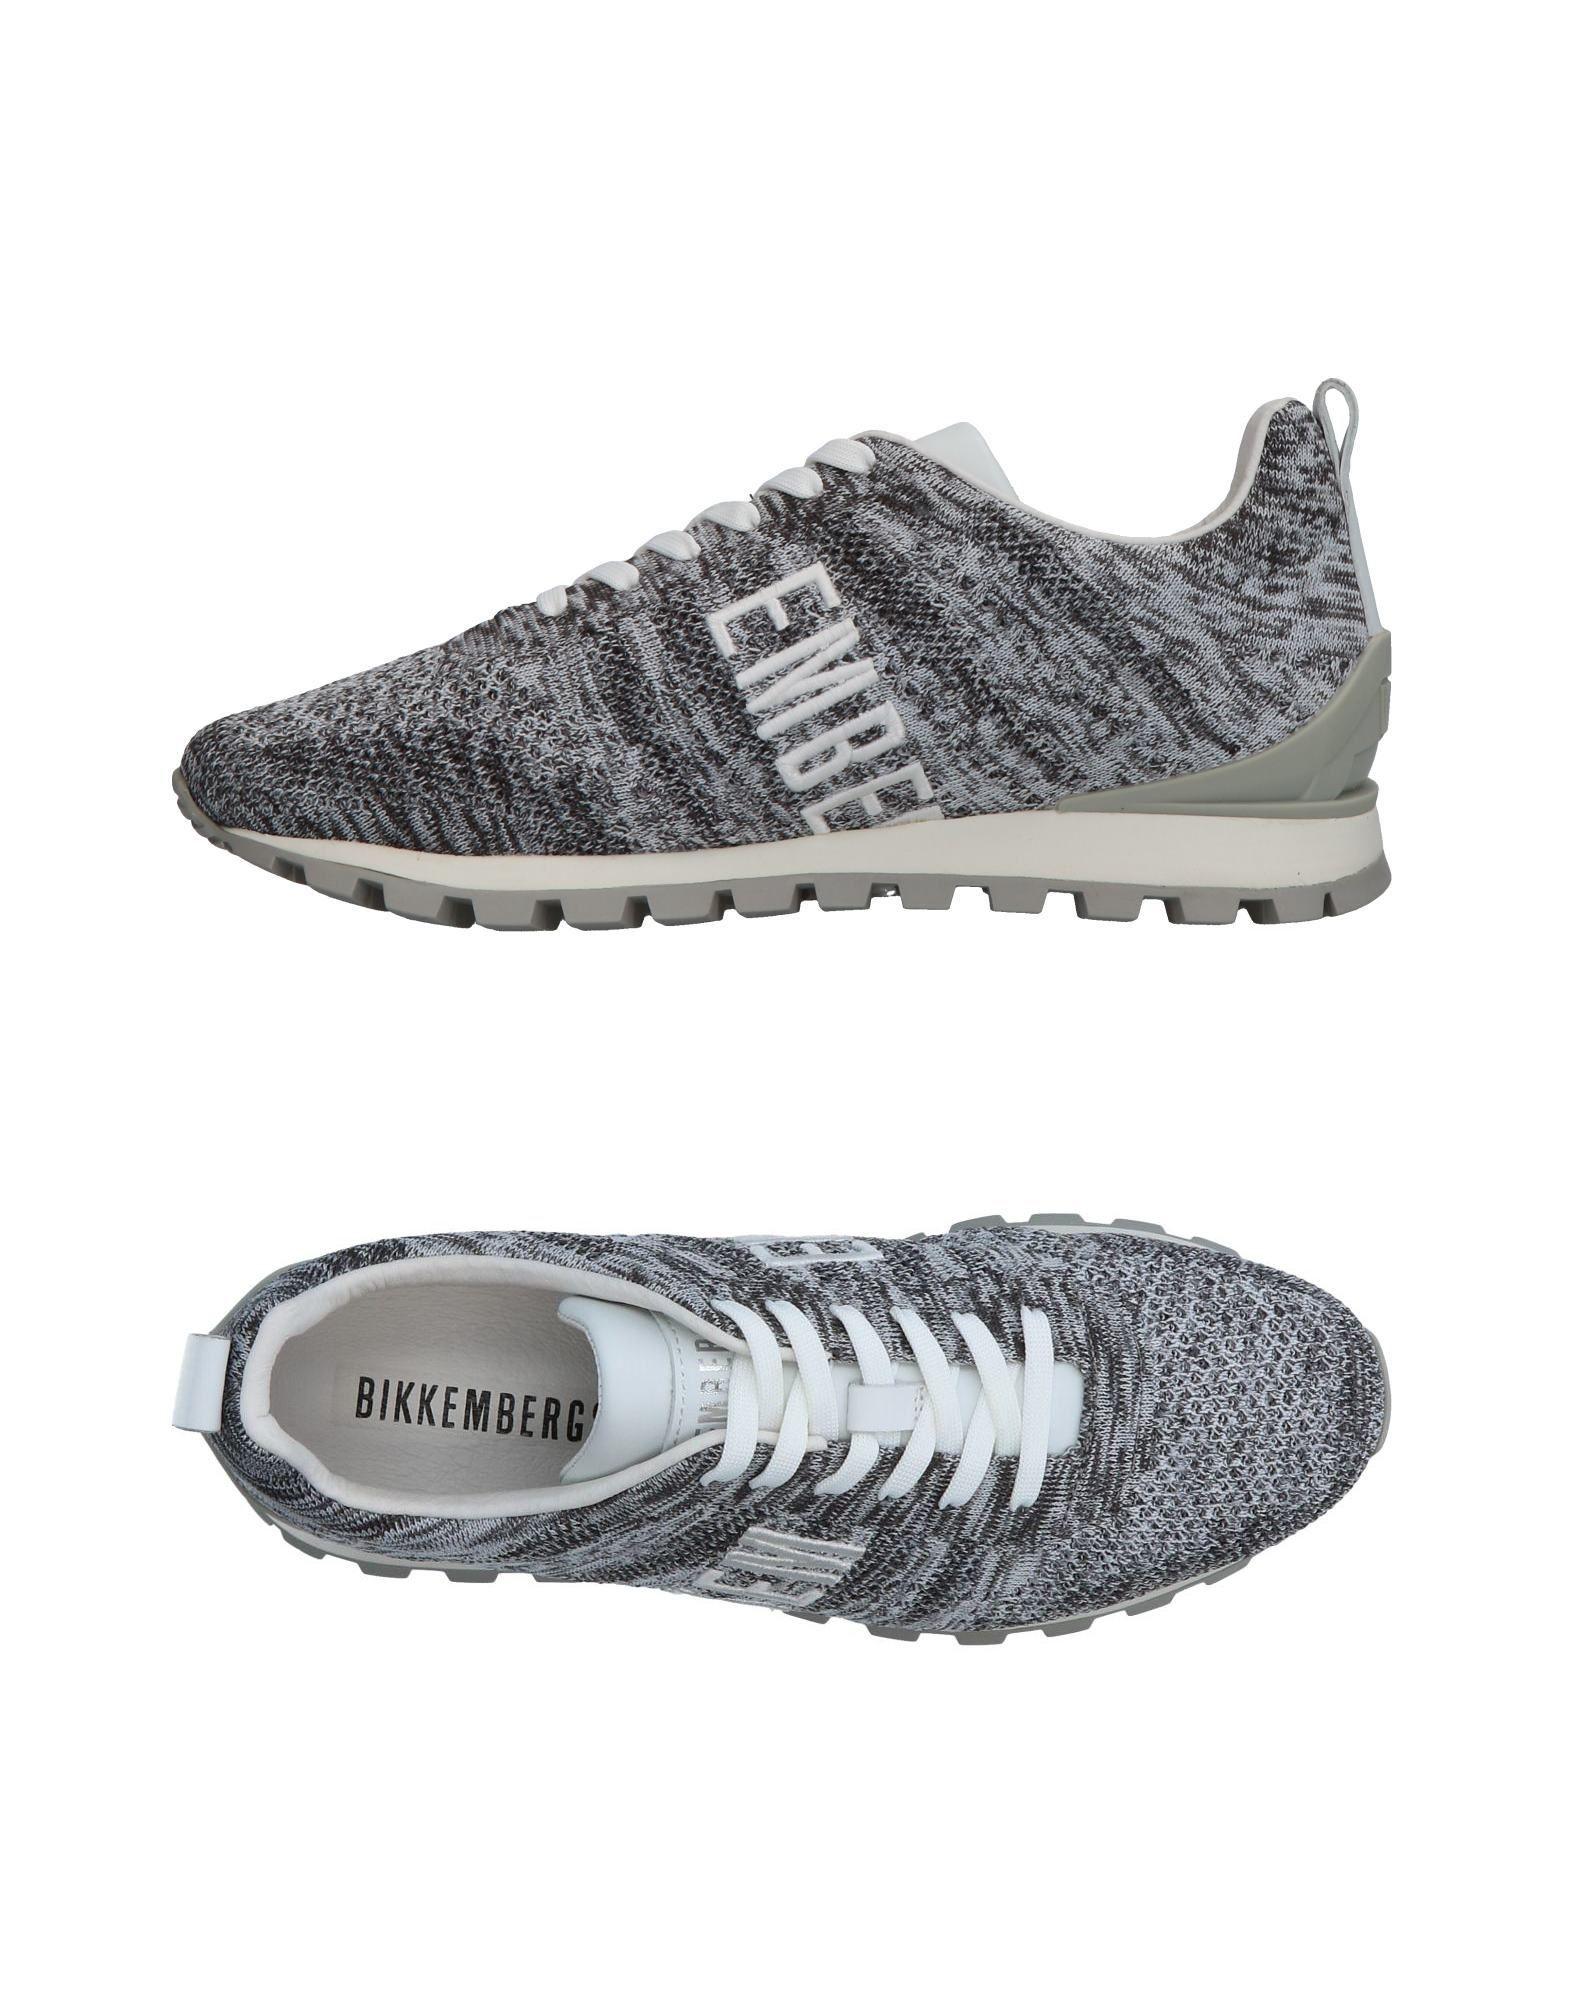 A buon mercato Sneakers Bikkembergs Uomo - 11332012GE